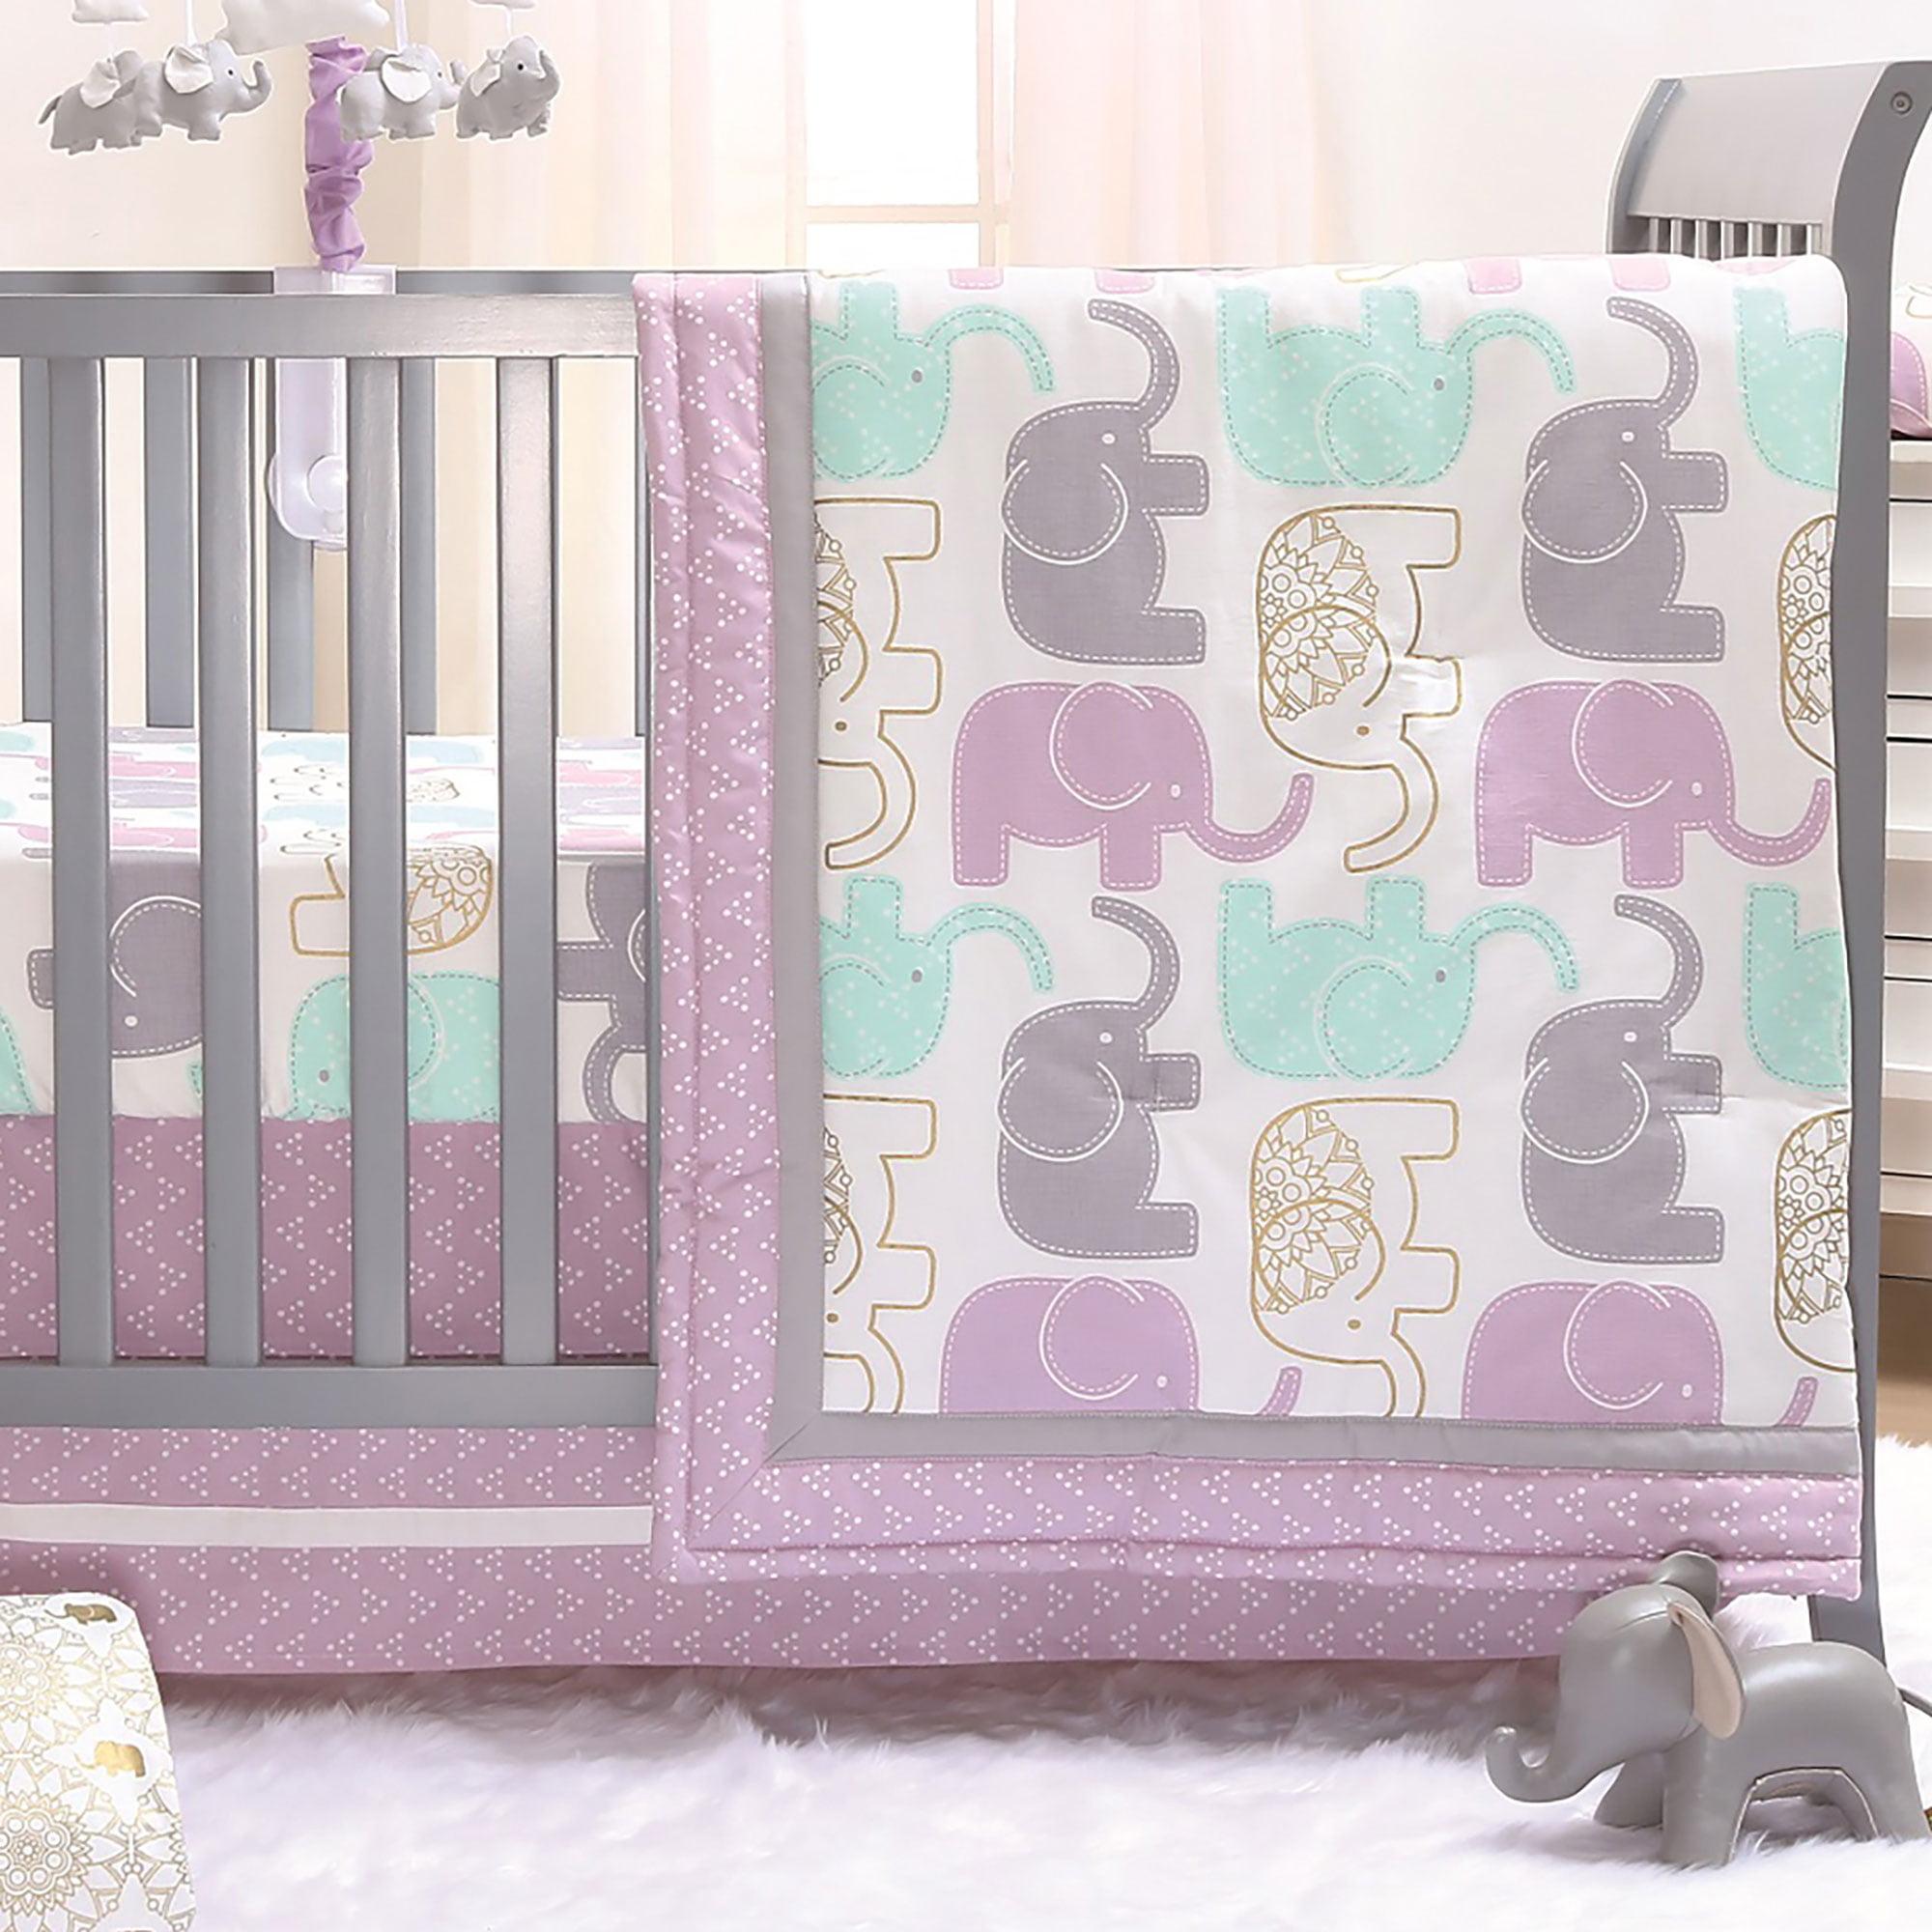 The Peanut Shell 3 Piece Baby Girl Crib Bedding Set - Little Peanut Lilac and Gold Elephants - 100% Cotton Fabrics